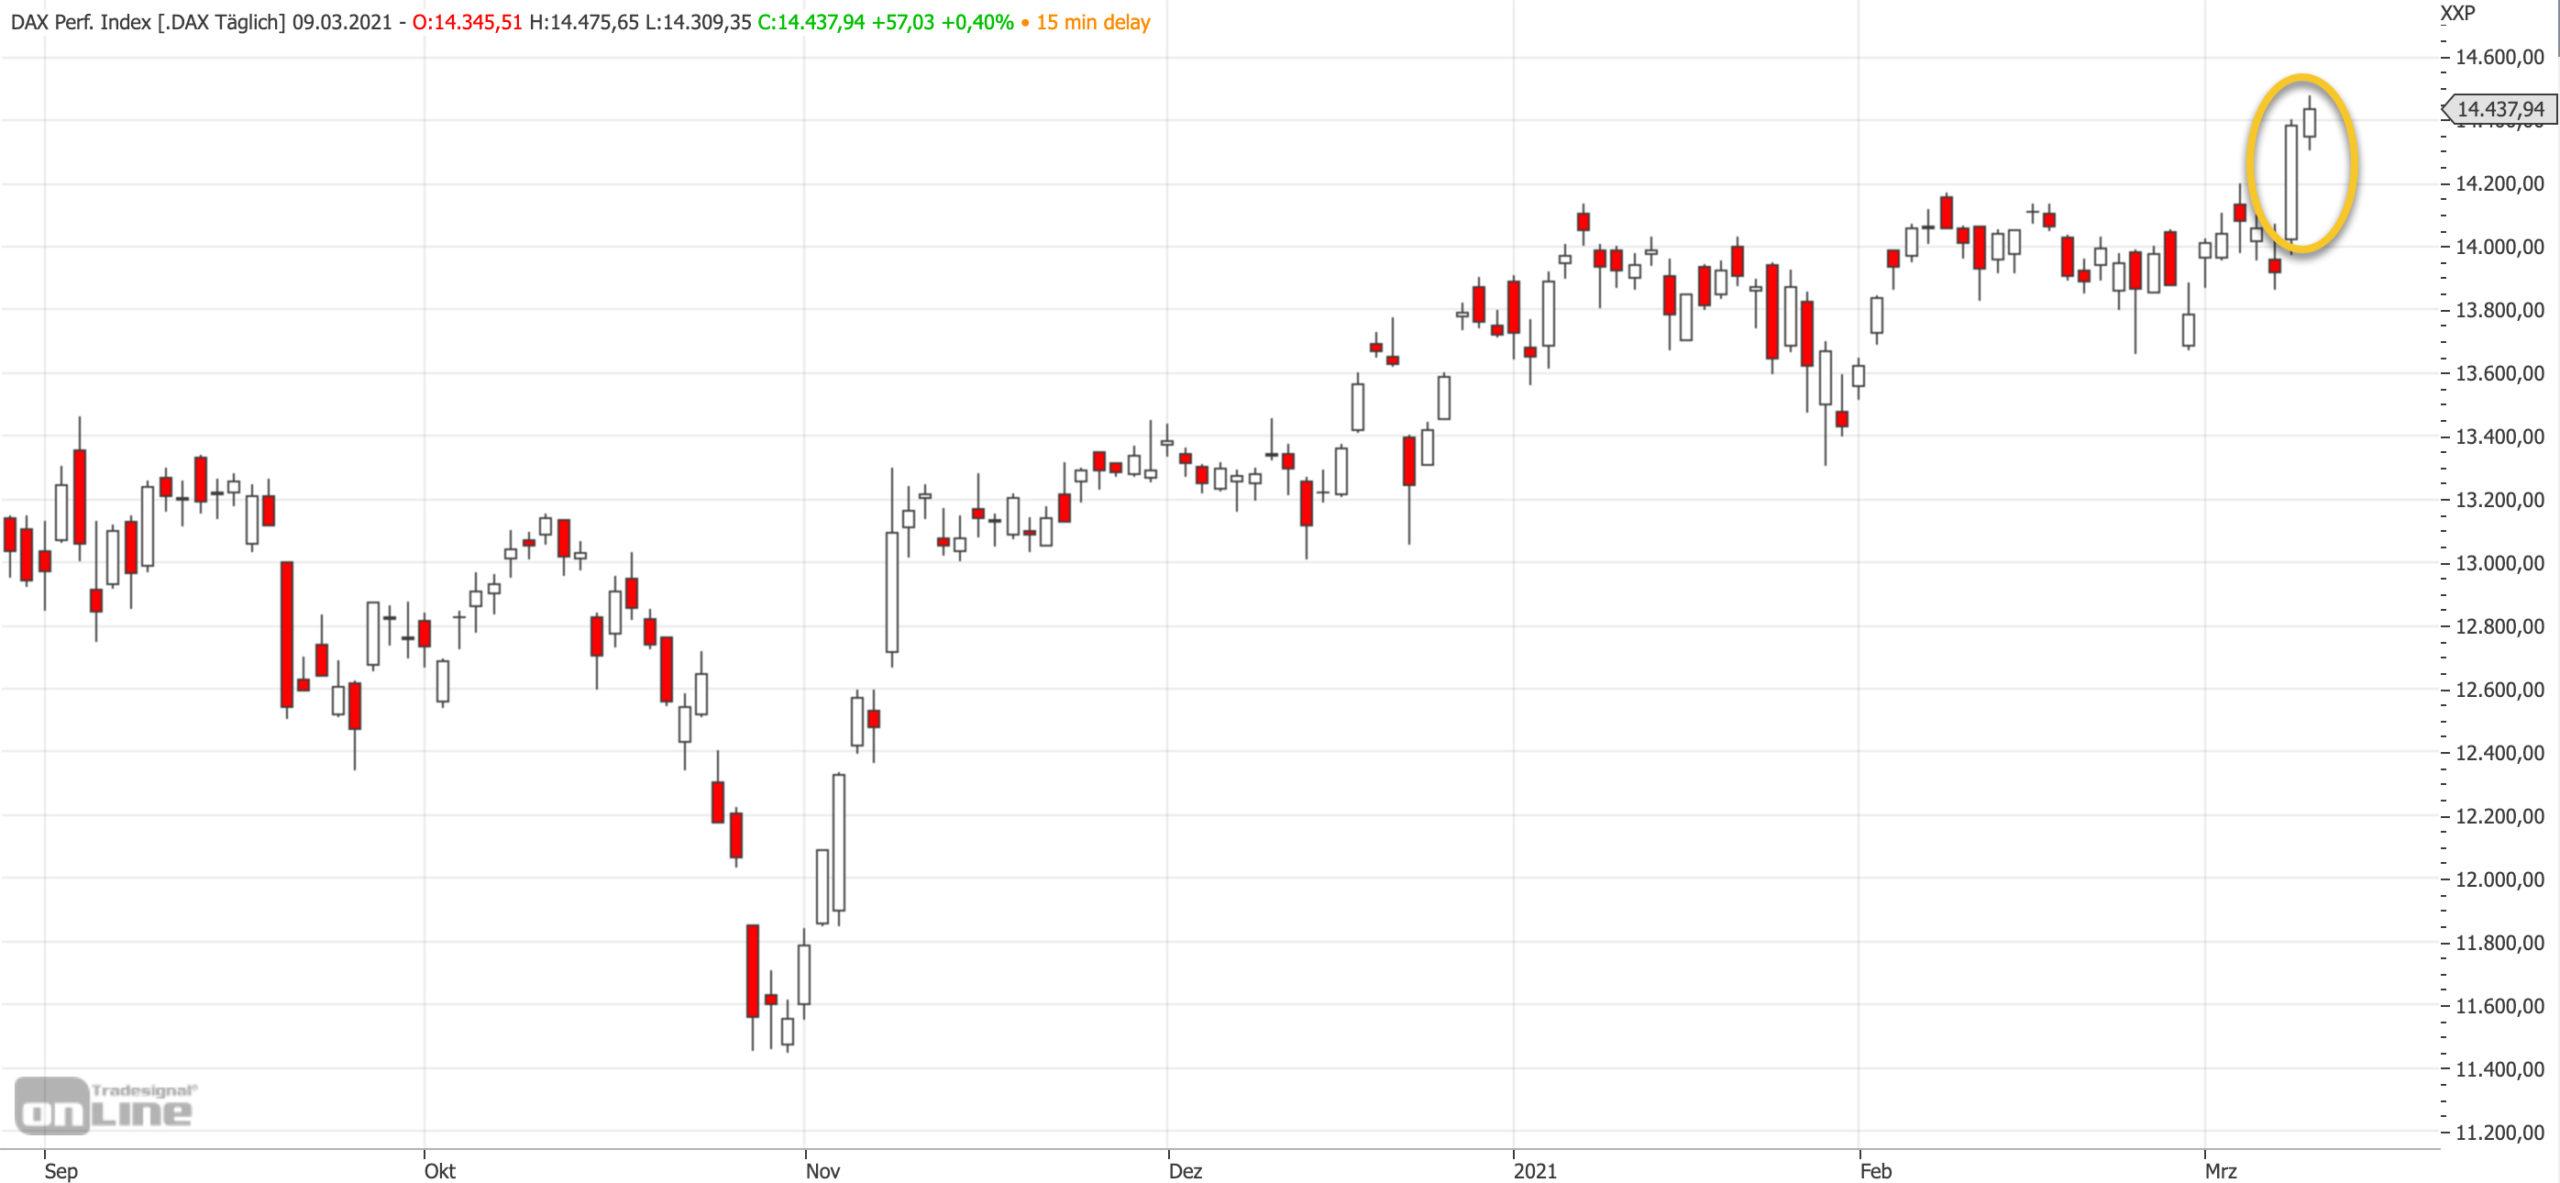 Mittelfristiger DAX-Chart am 09.03.2021